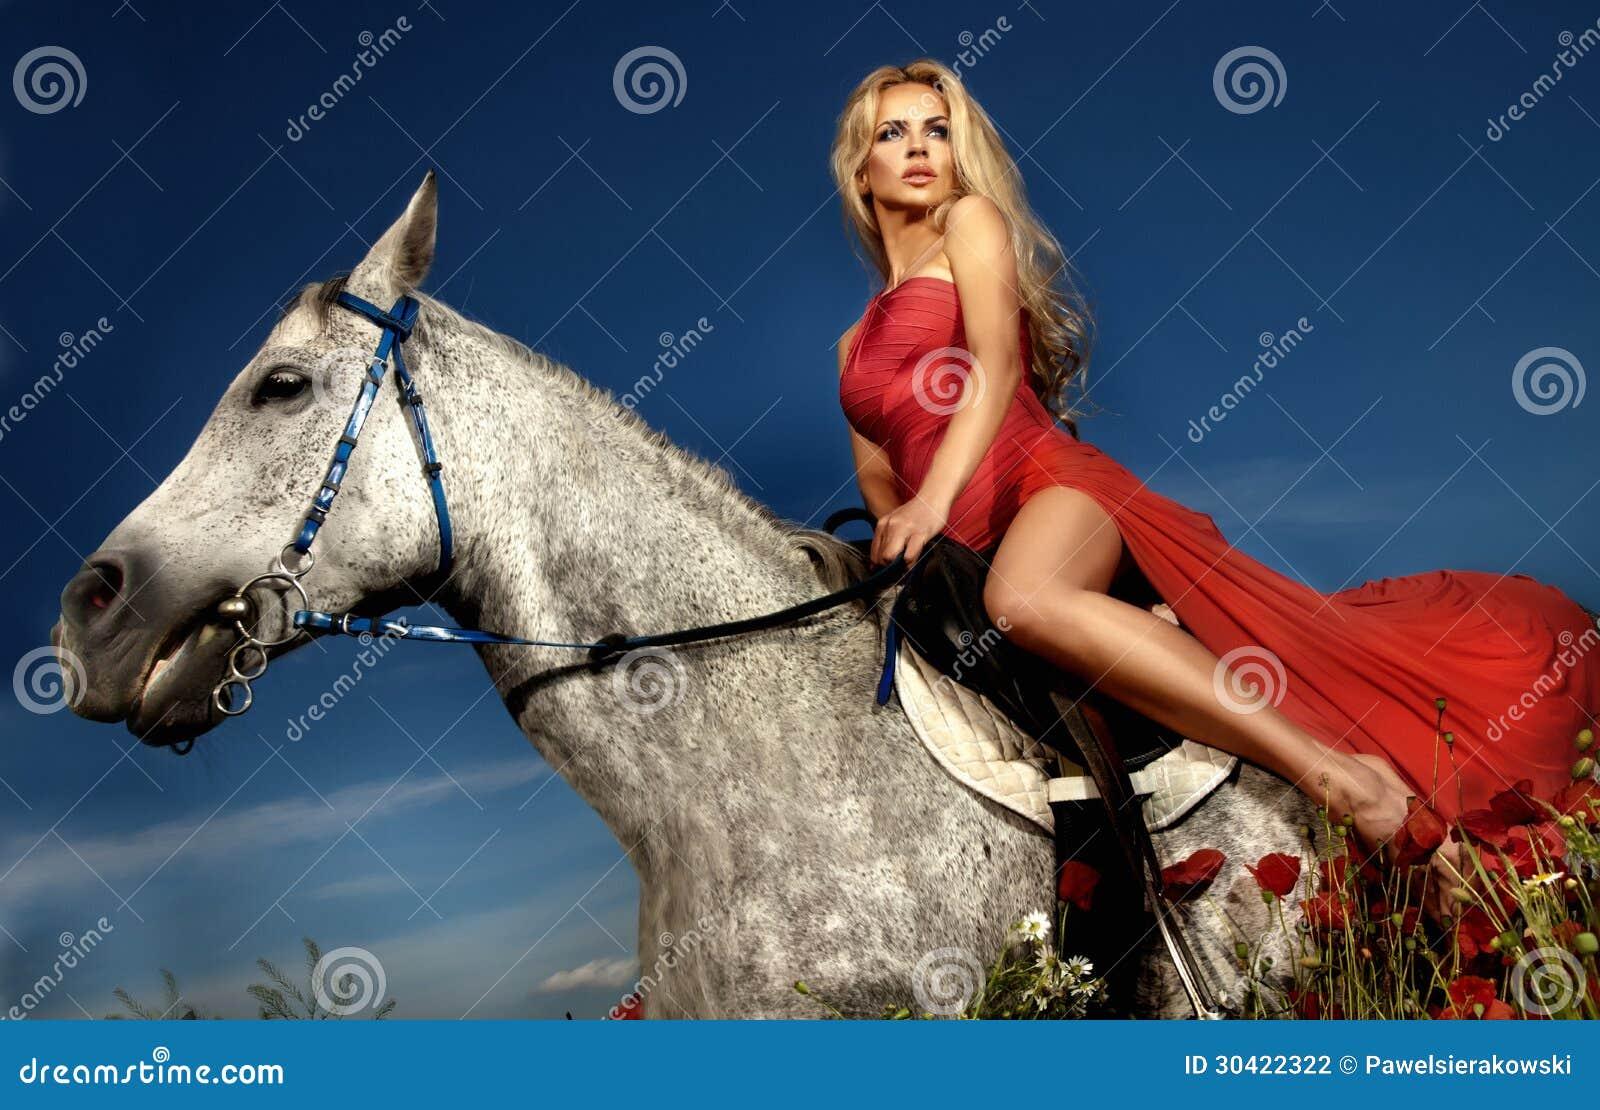 Stars Nude Reiten Ein Pferd Pics